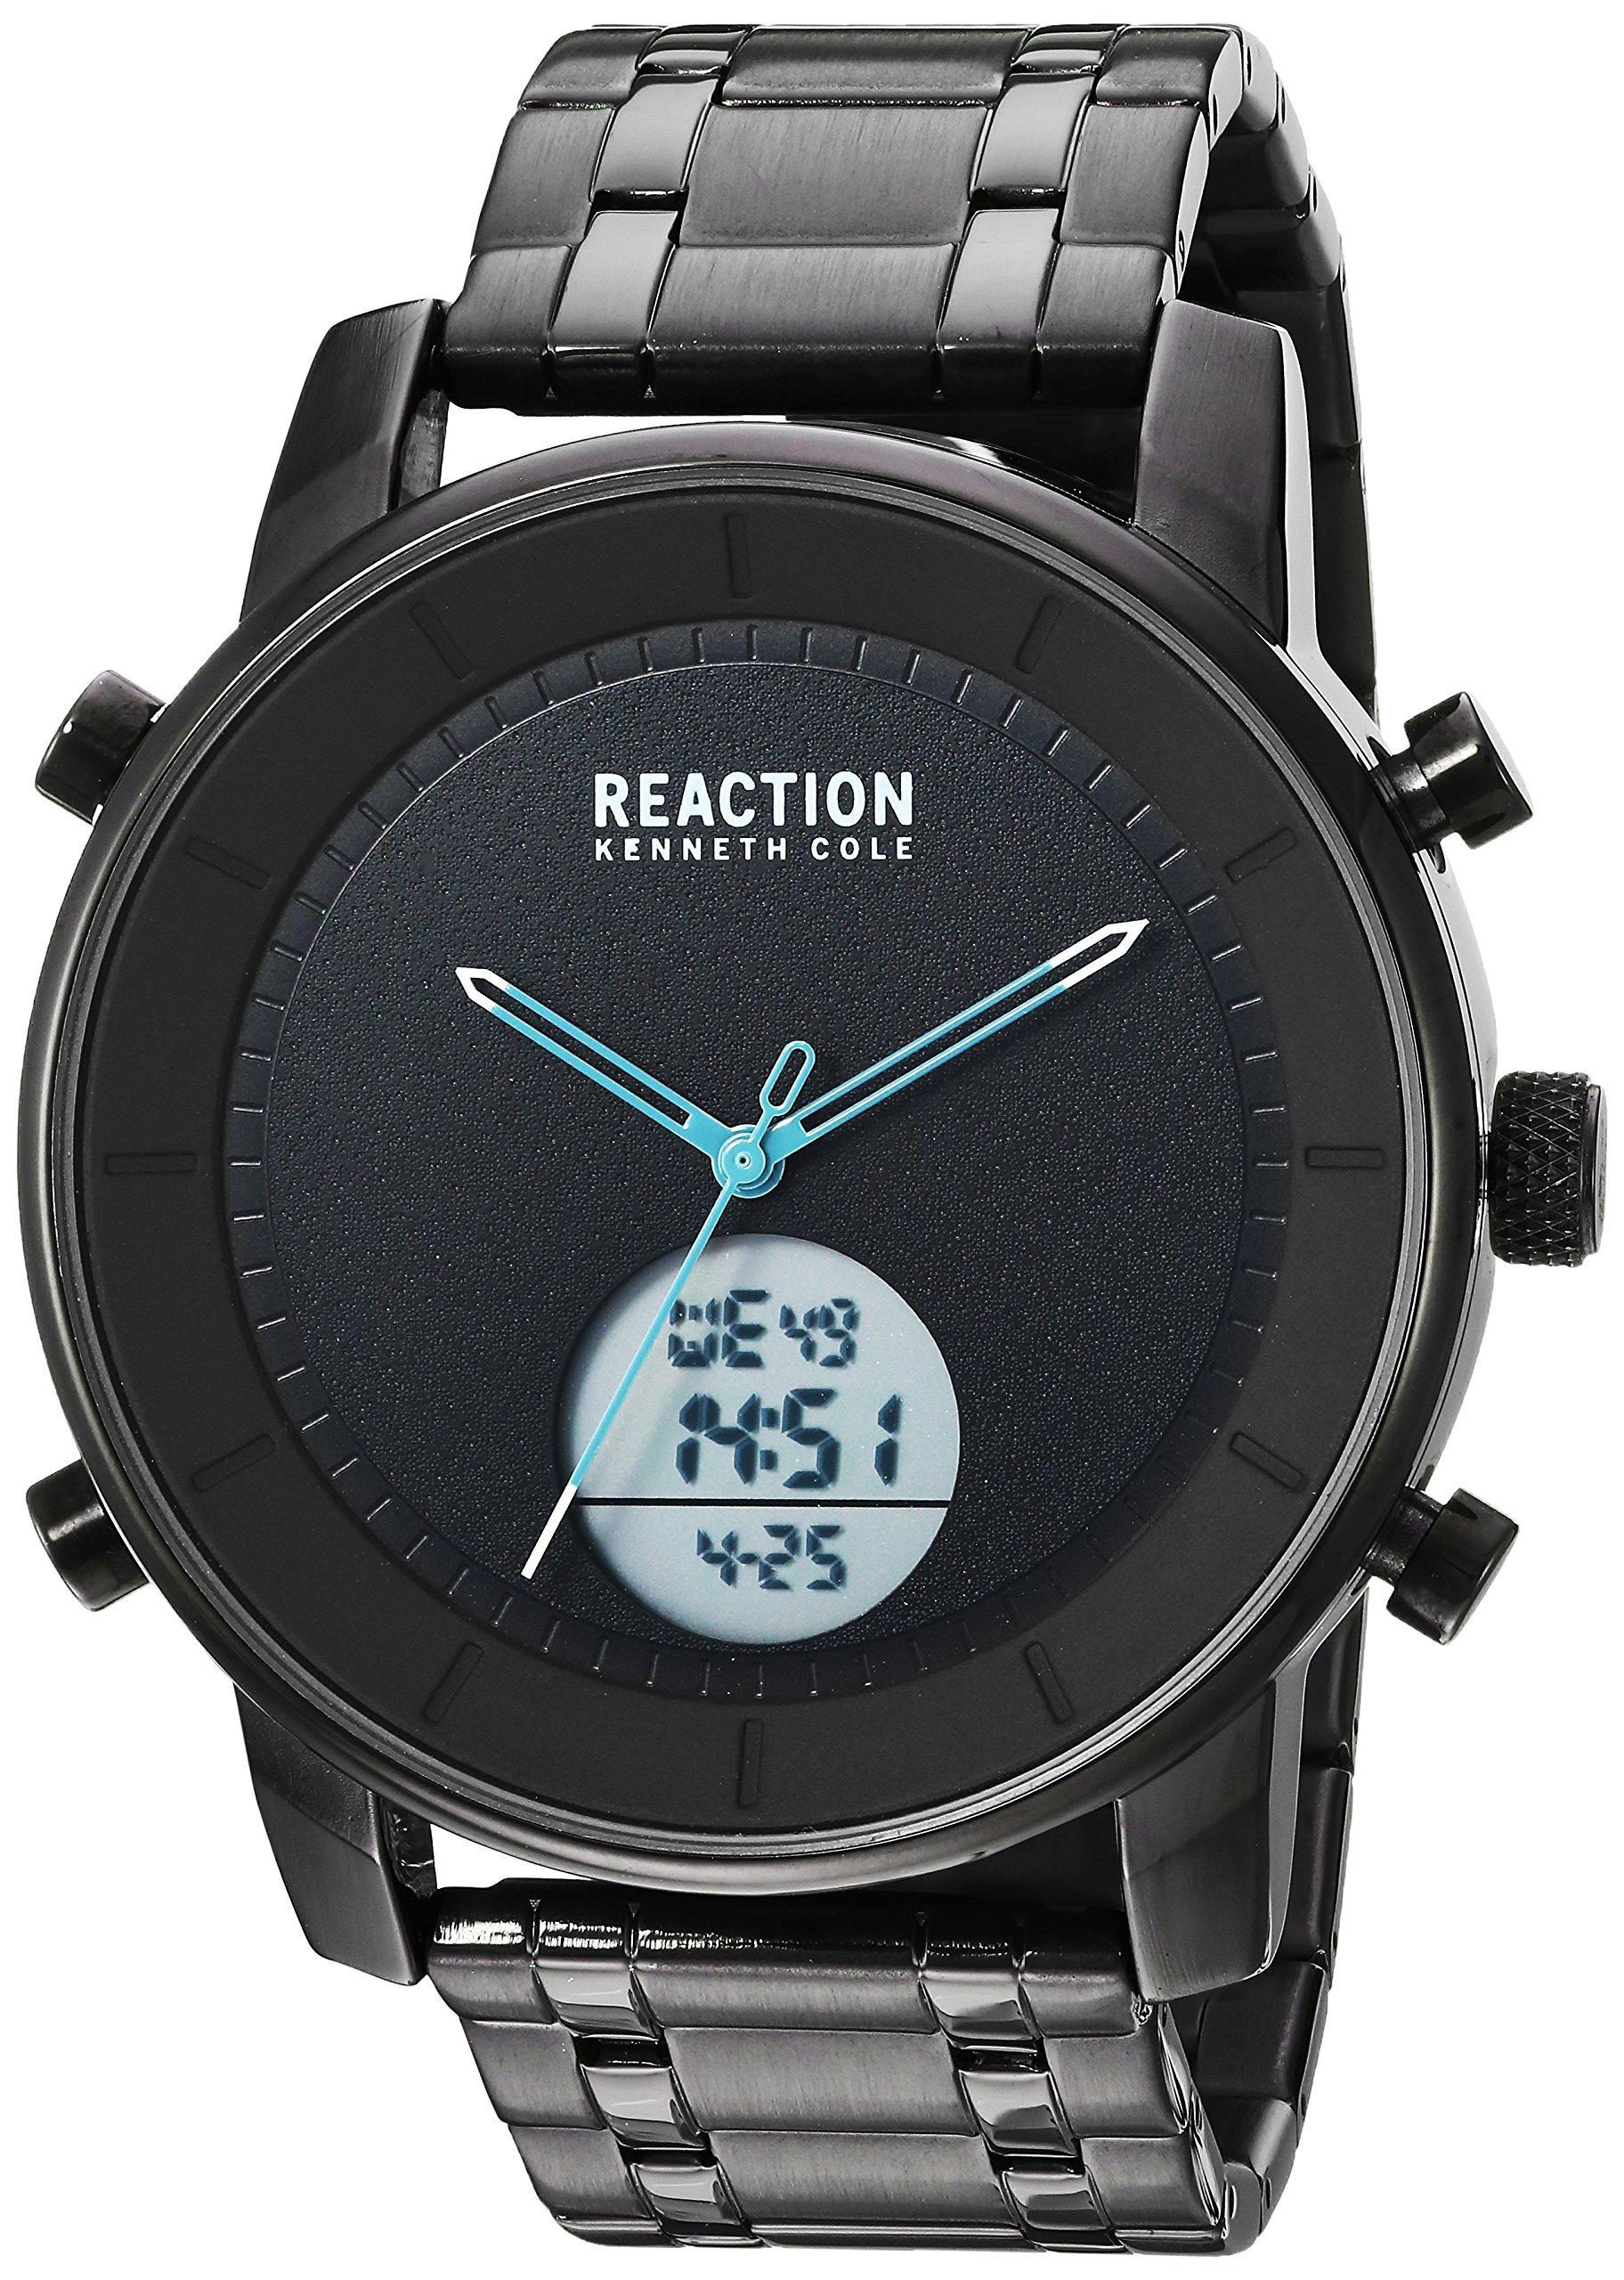 Kenneth Cole REACTION Men's RK50083009 Analog-Digital Display Analog Quartz Black Watch by Kenneth Cole REACTION